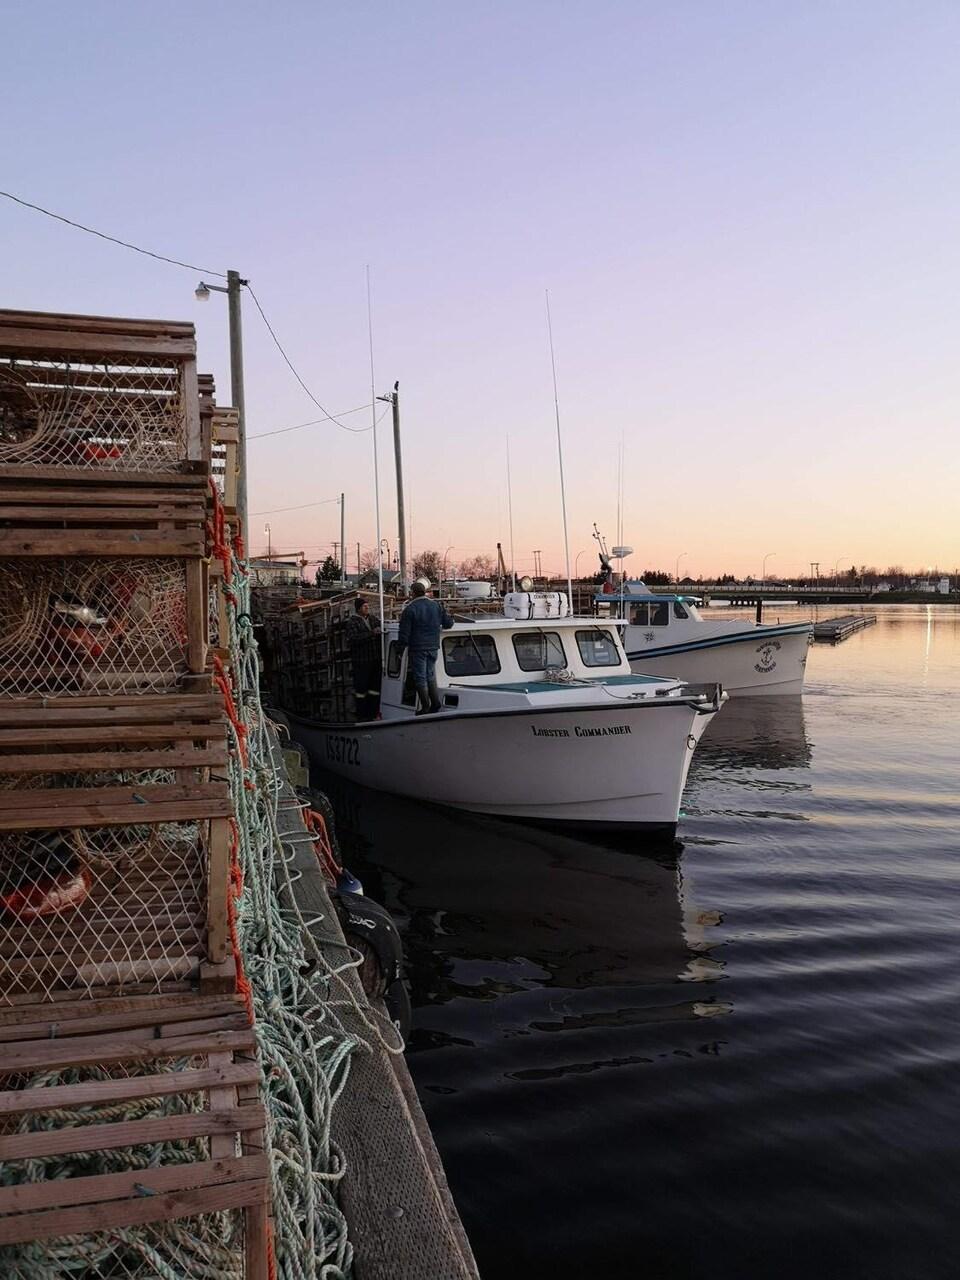 Un bateau pêche à quai.